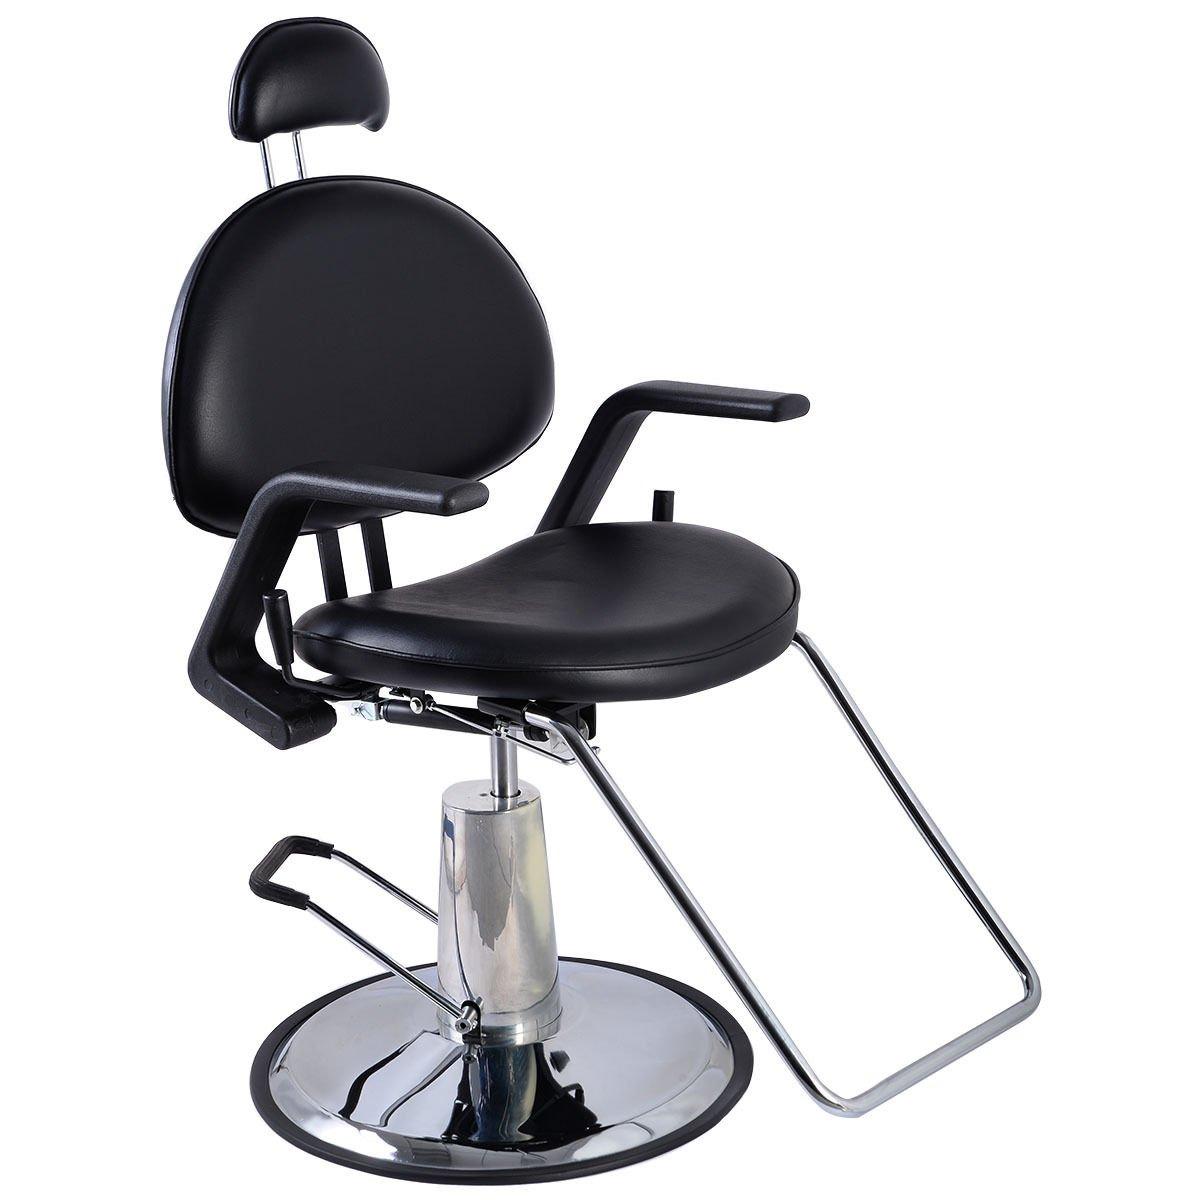 Eight24hours New Reclining Hydraulic Barber Chair Salon Beauty Spa Shampoo Styling Equipment